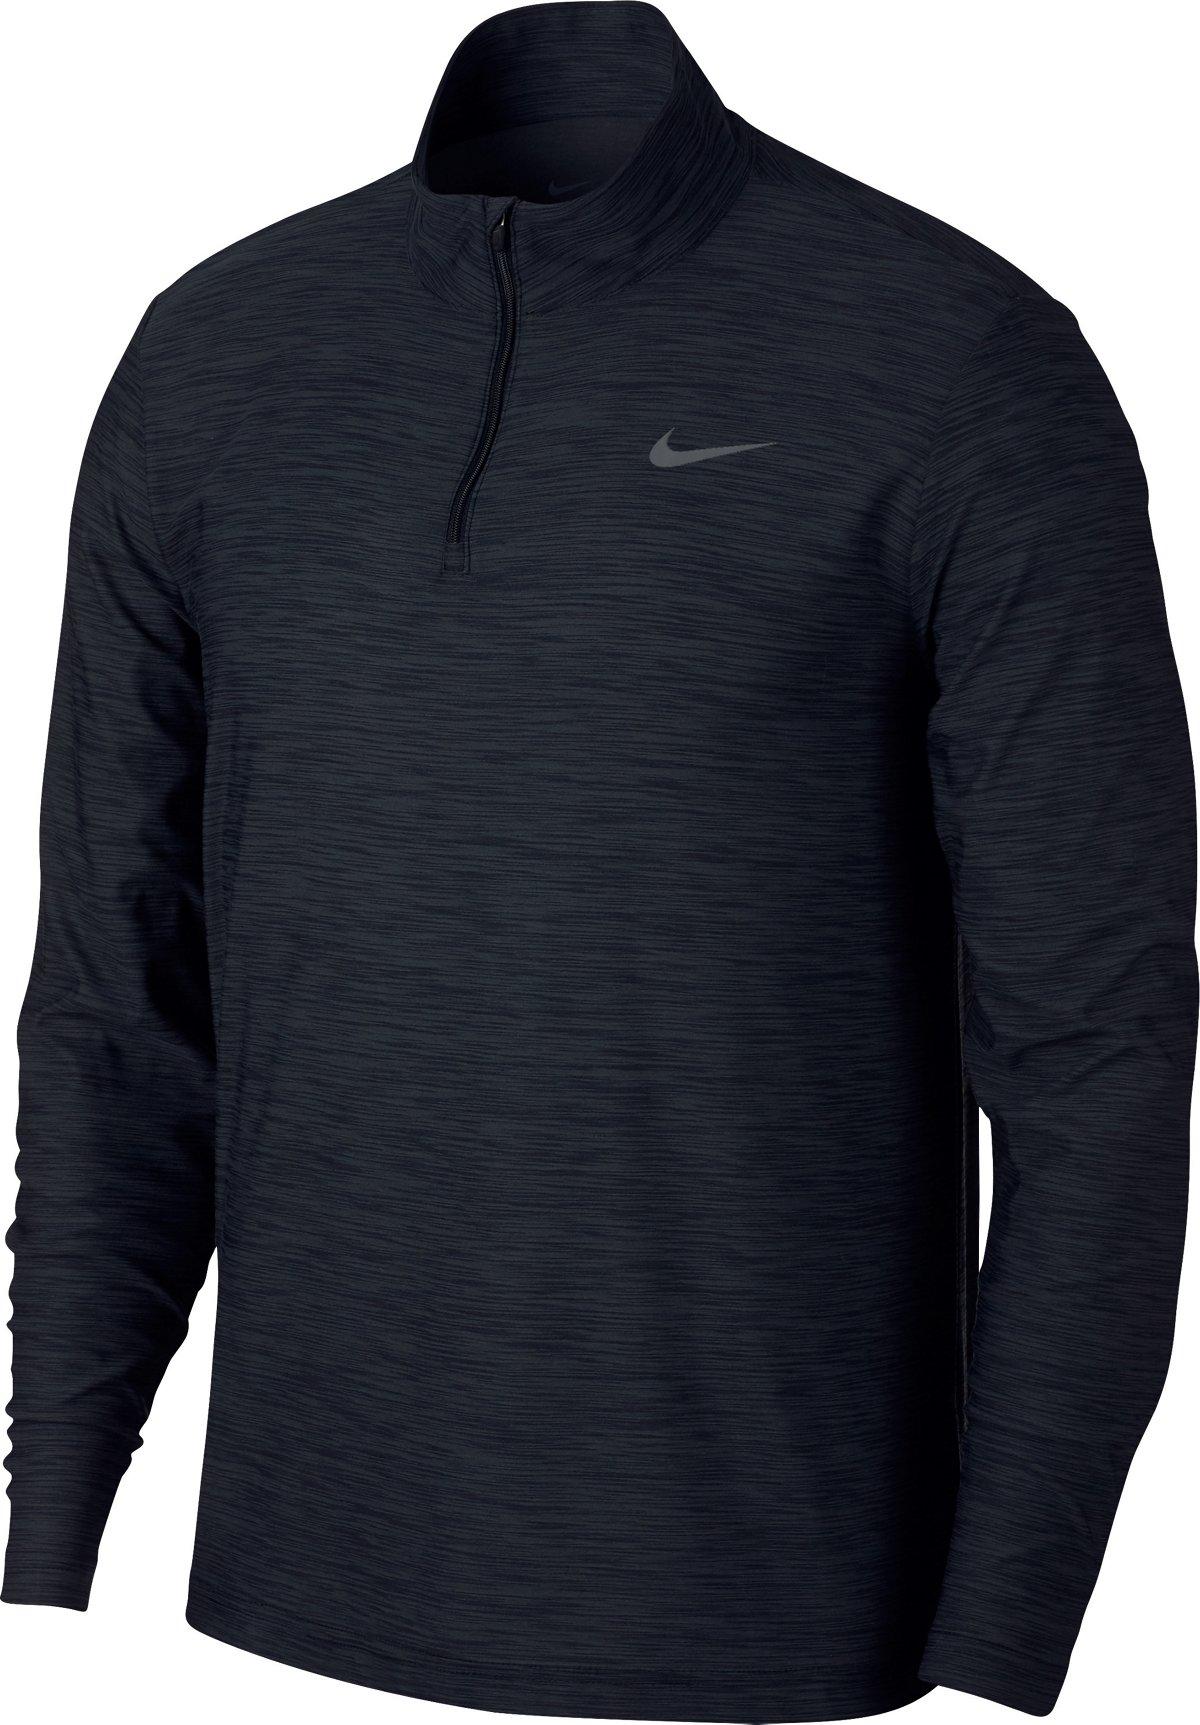 2-Pack Nike Men's Breathe Dry 1/4 Zip Training Pullover Just $37